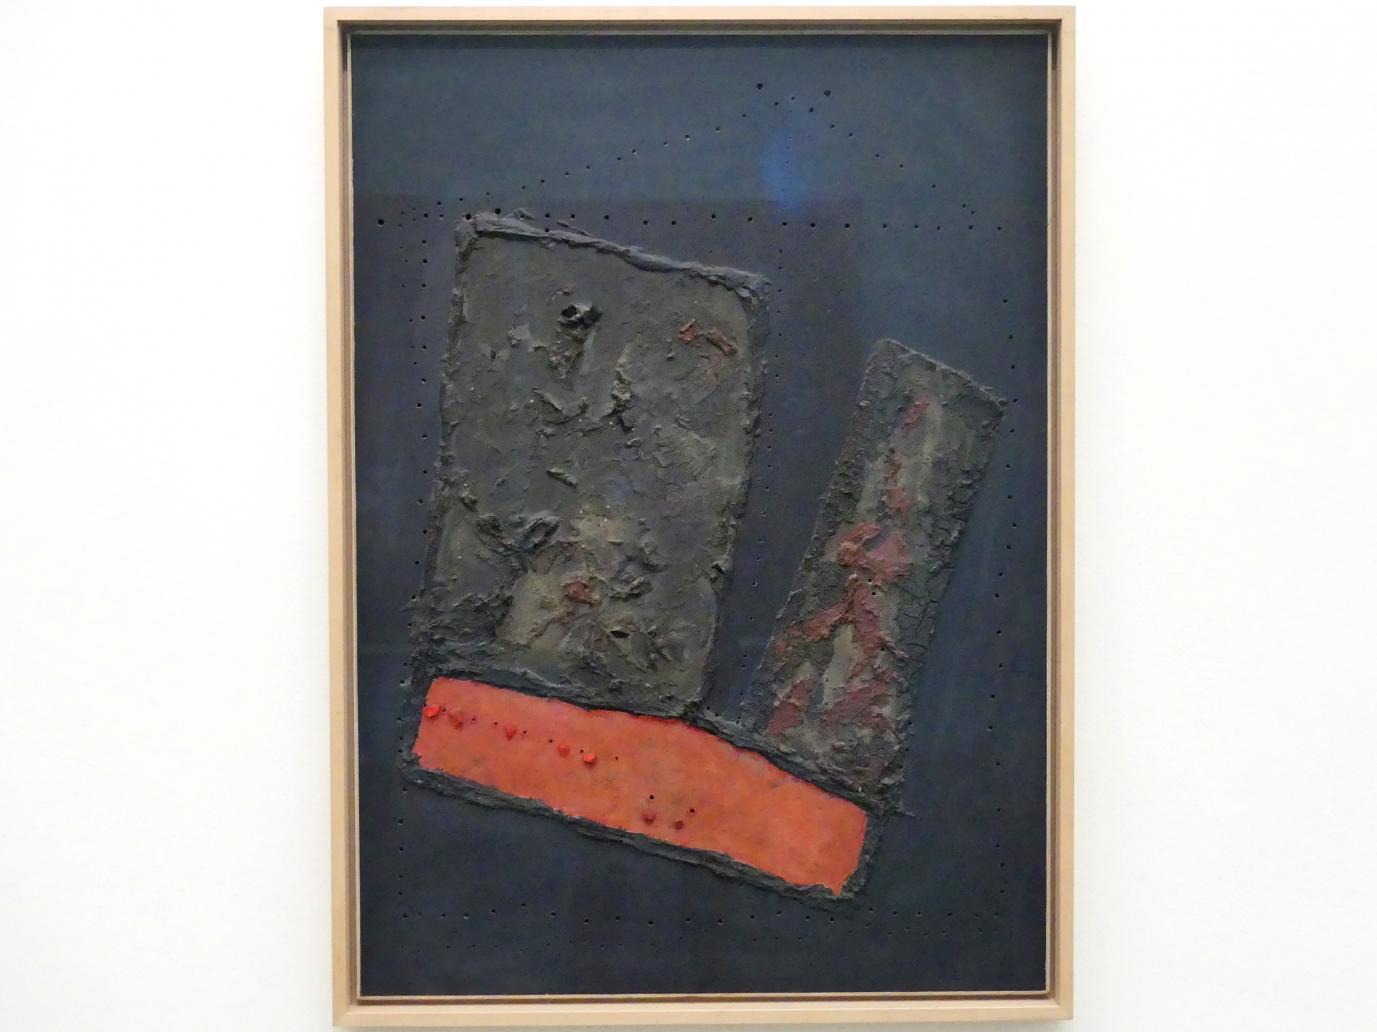 Lucio Fontana: Concetto spaziale, 56 BA 15 - Raumkonzept, 56 BA 15, 1956